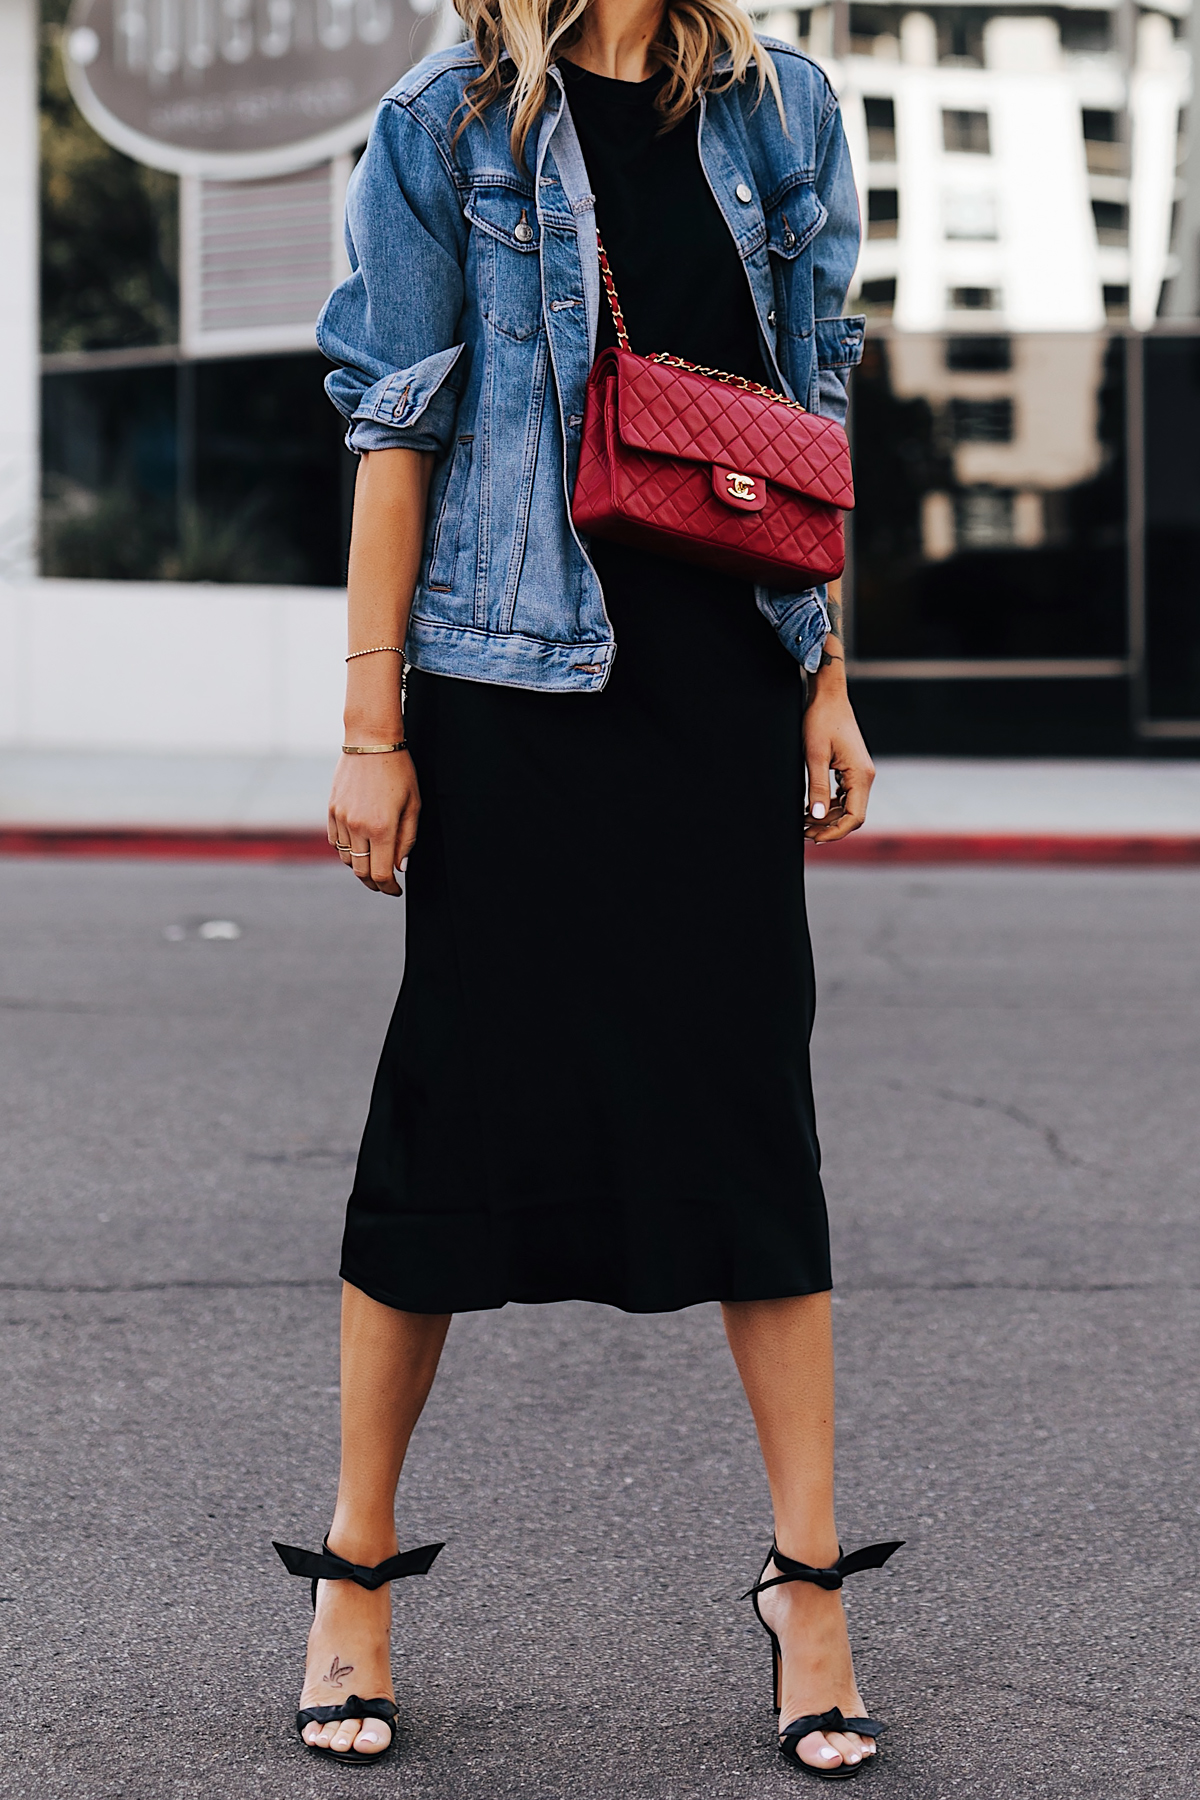 Fashion Jackson Wearing Denim Jacket Black Tshirt Black Silk Skirt Red Chanel Handbag Alexandre Birman Clarita Black Sandals